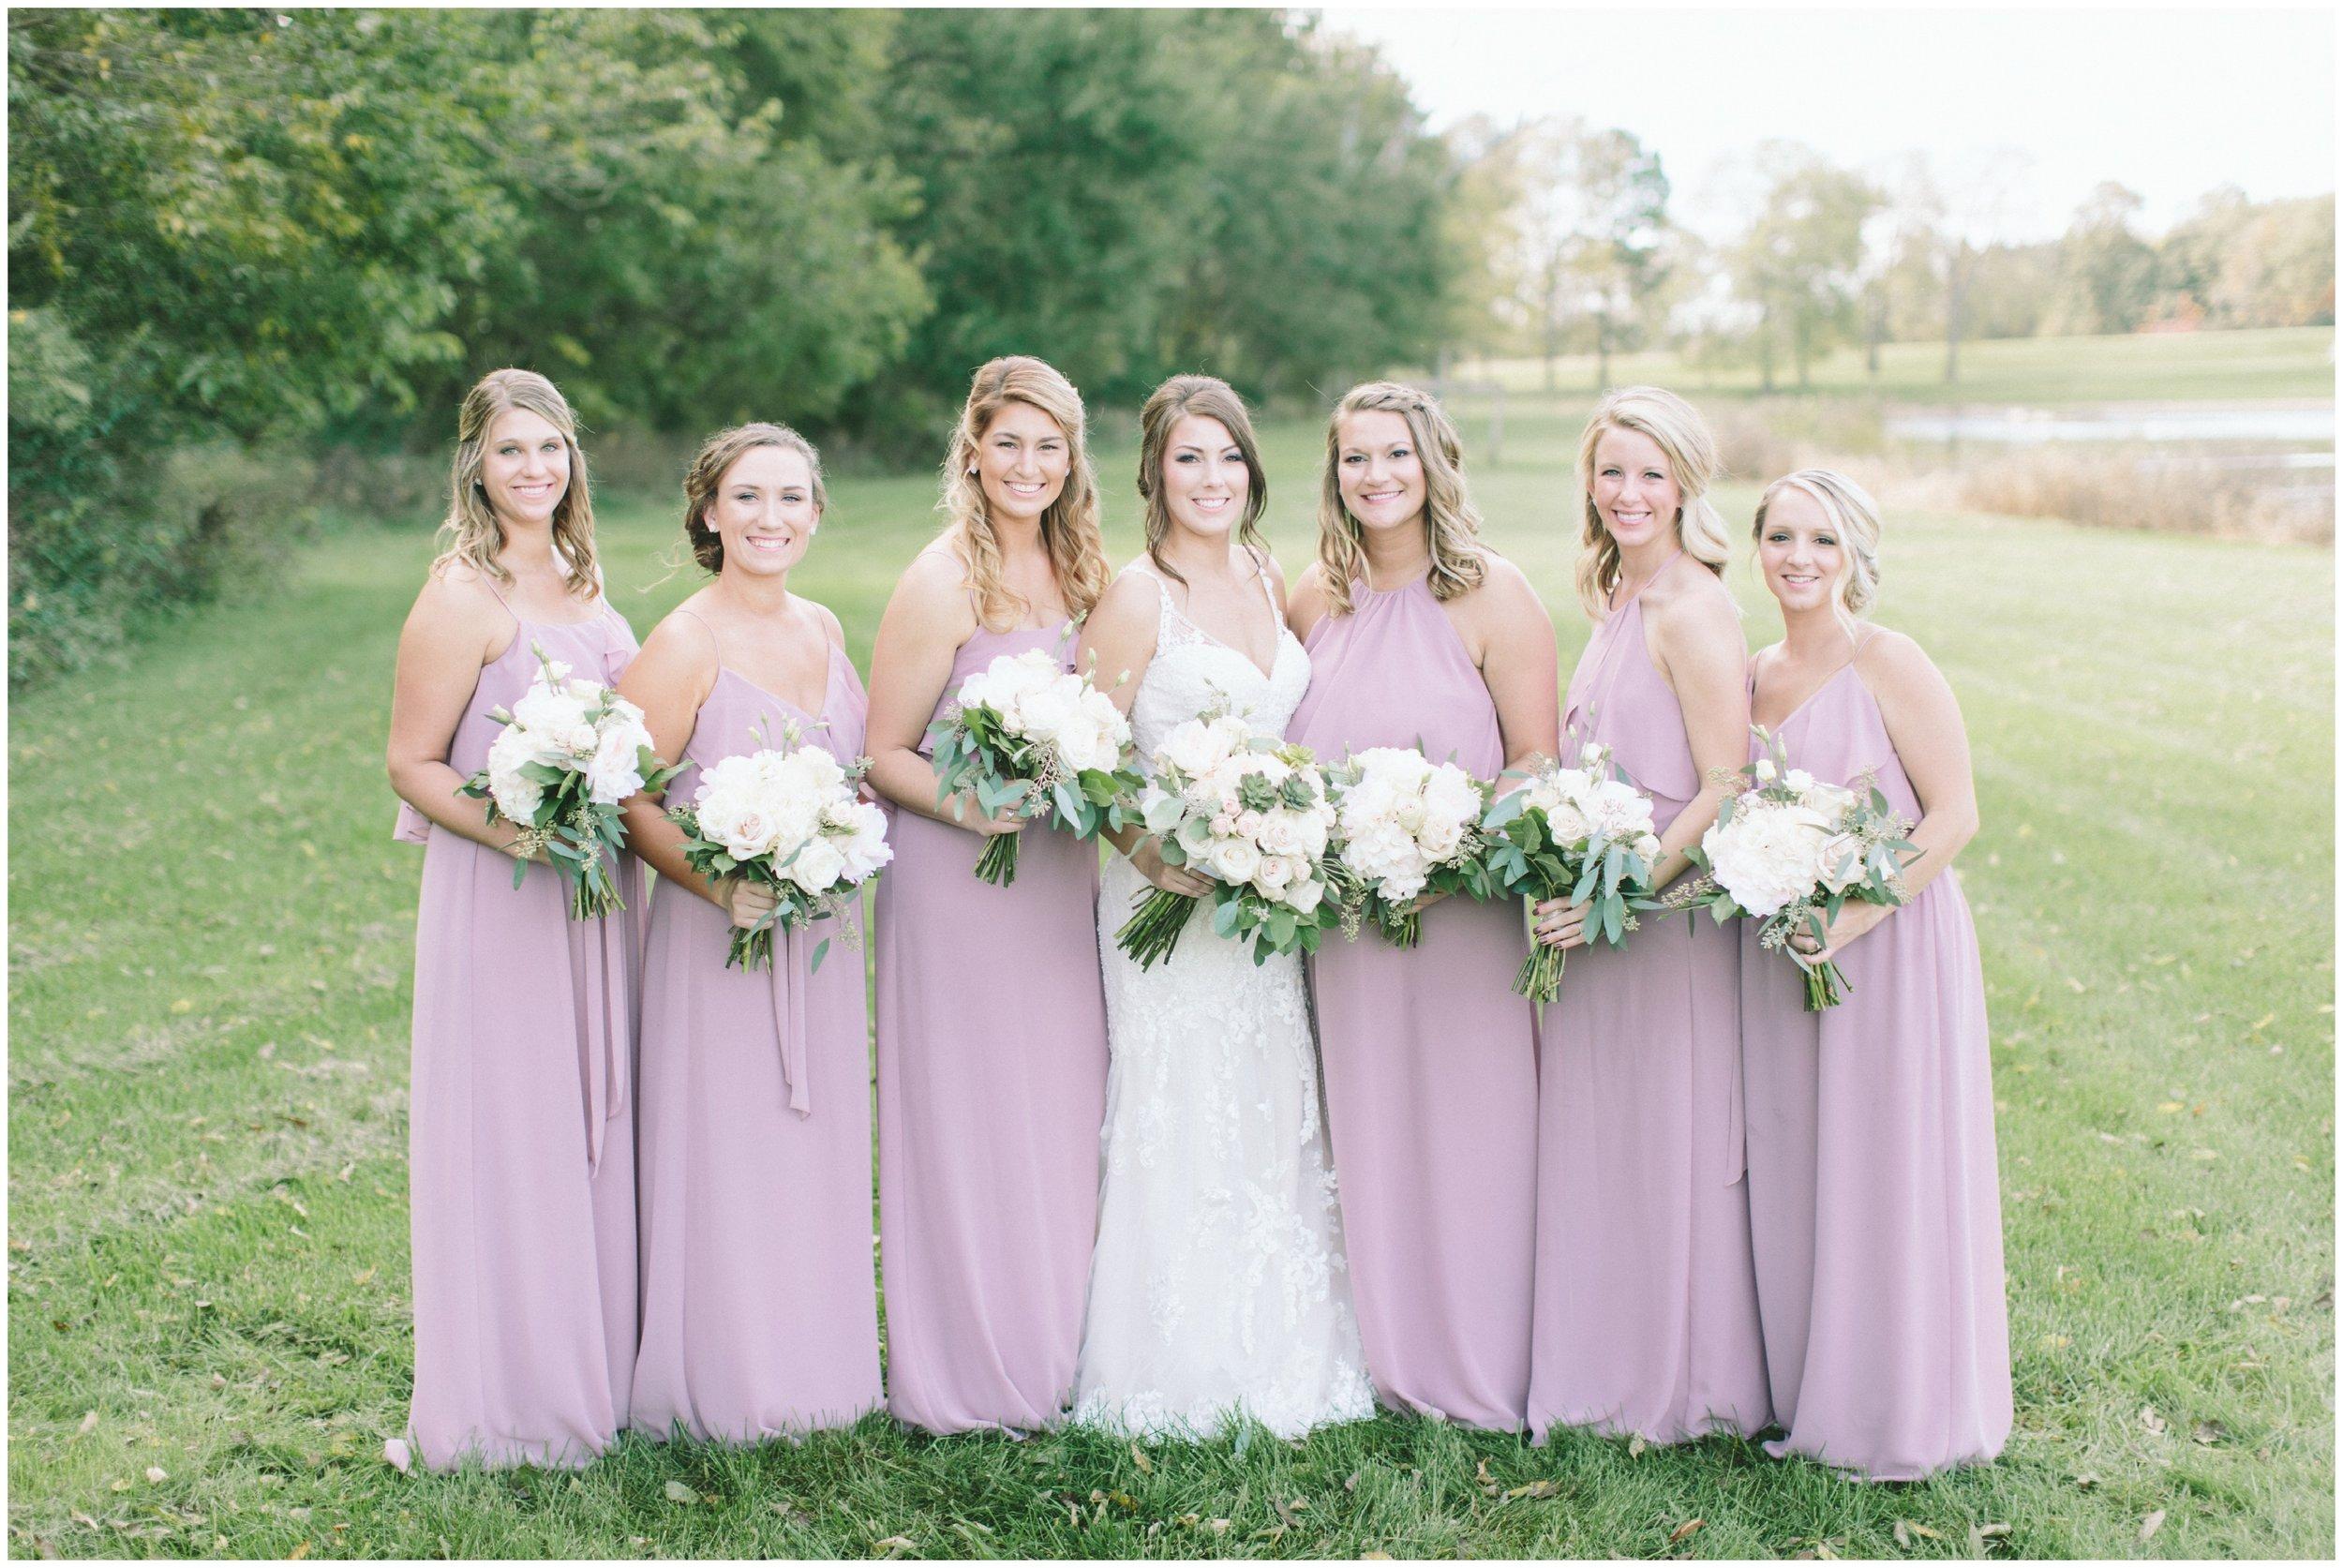 Indiana Wedding 40.JPG